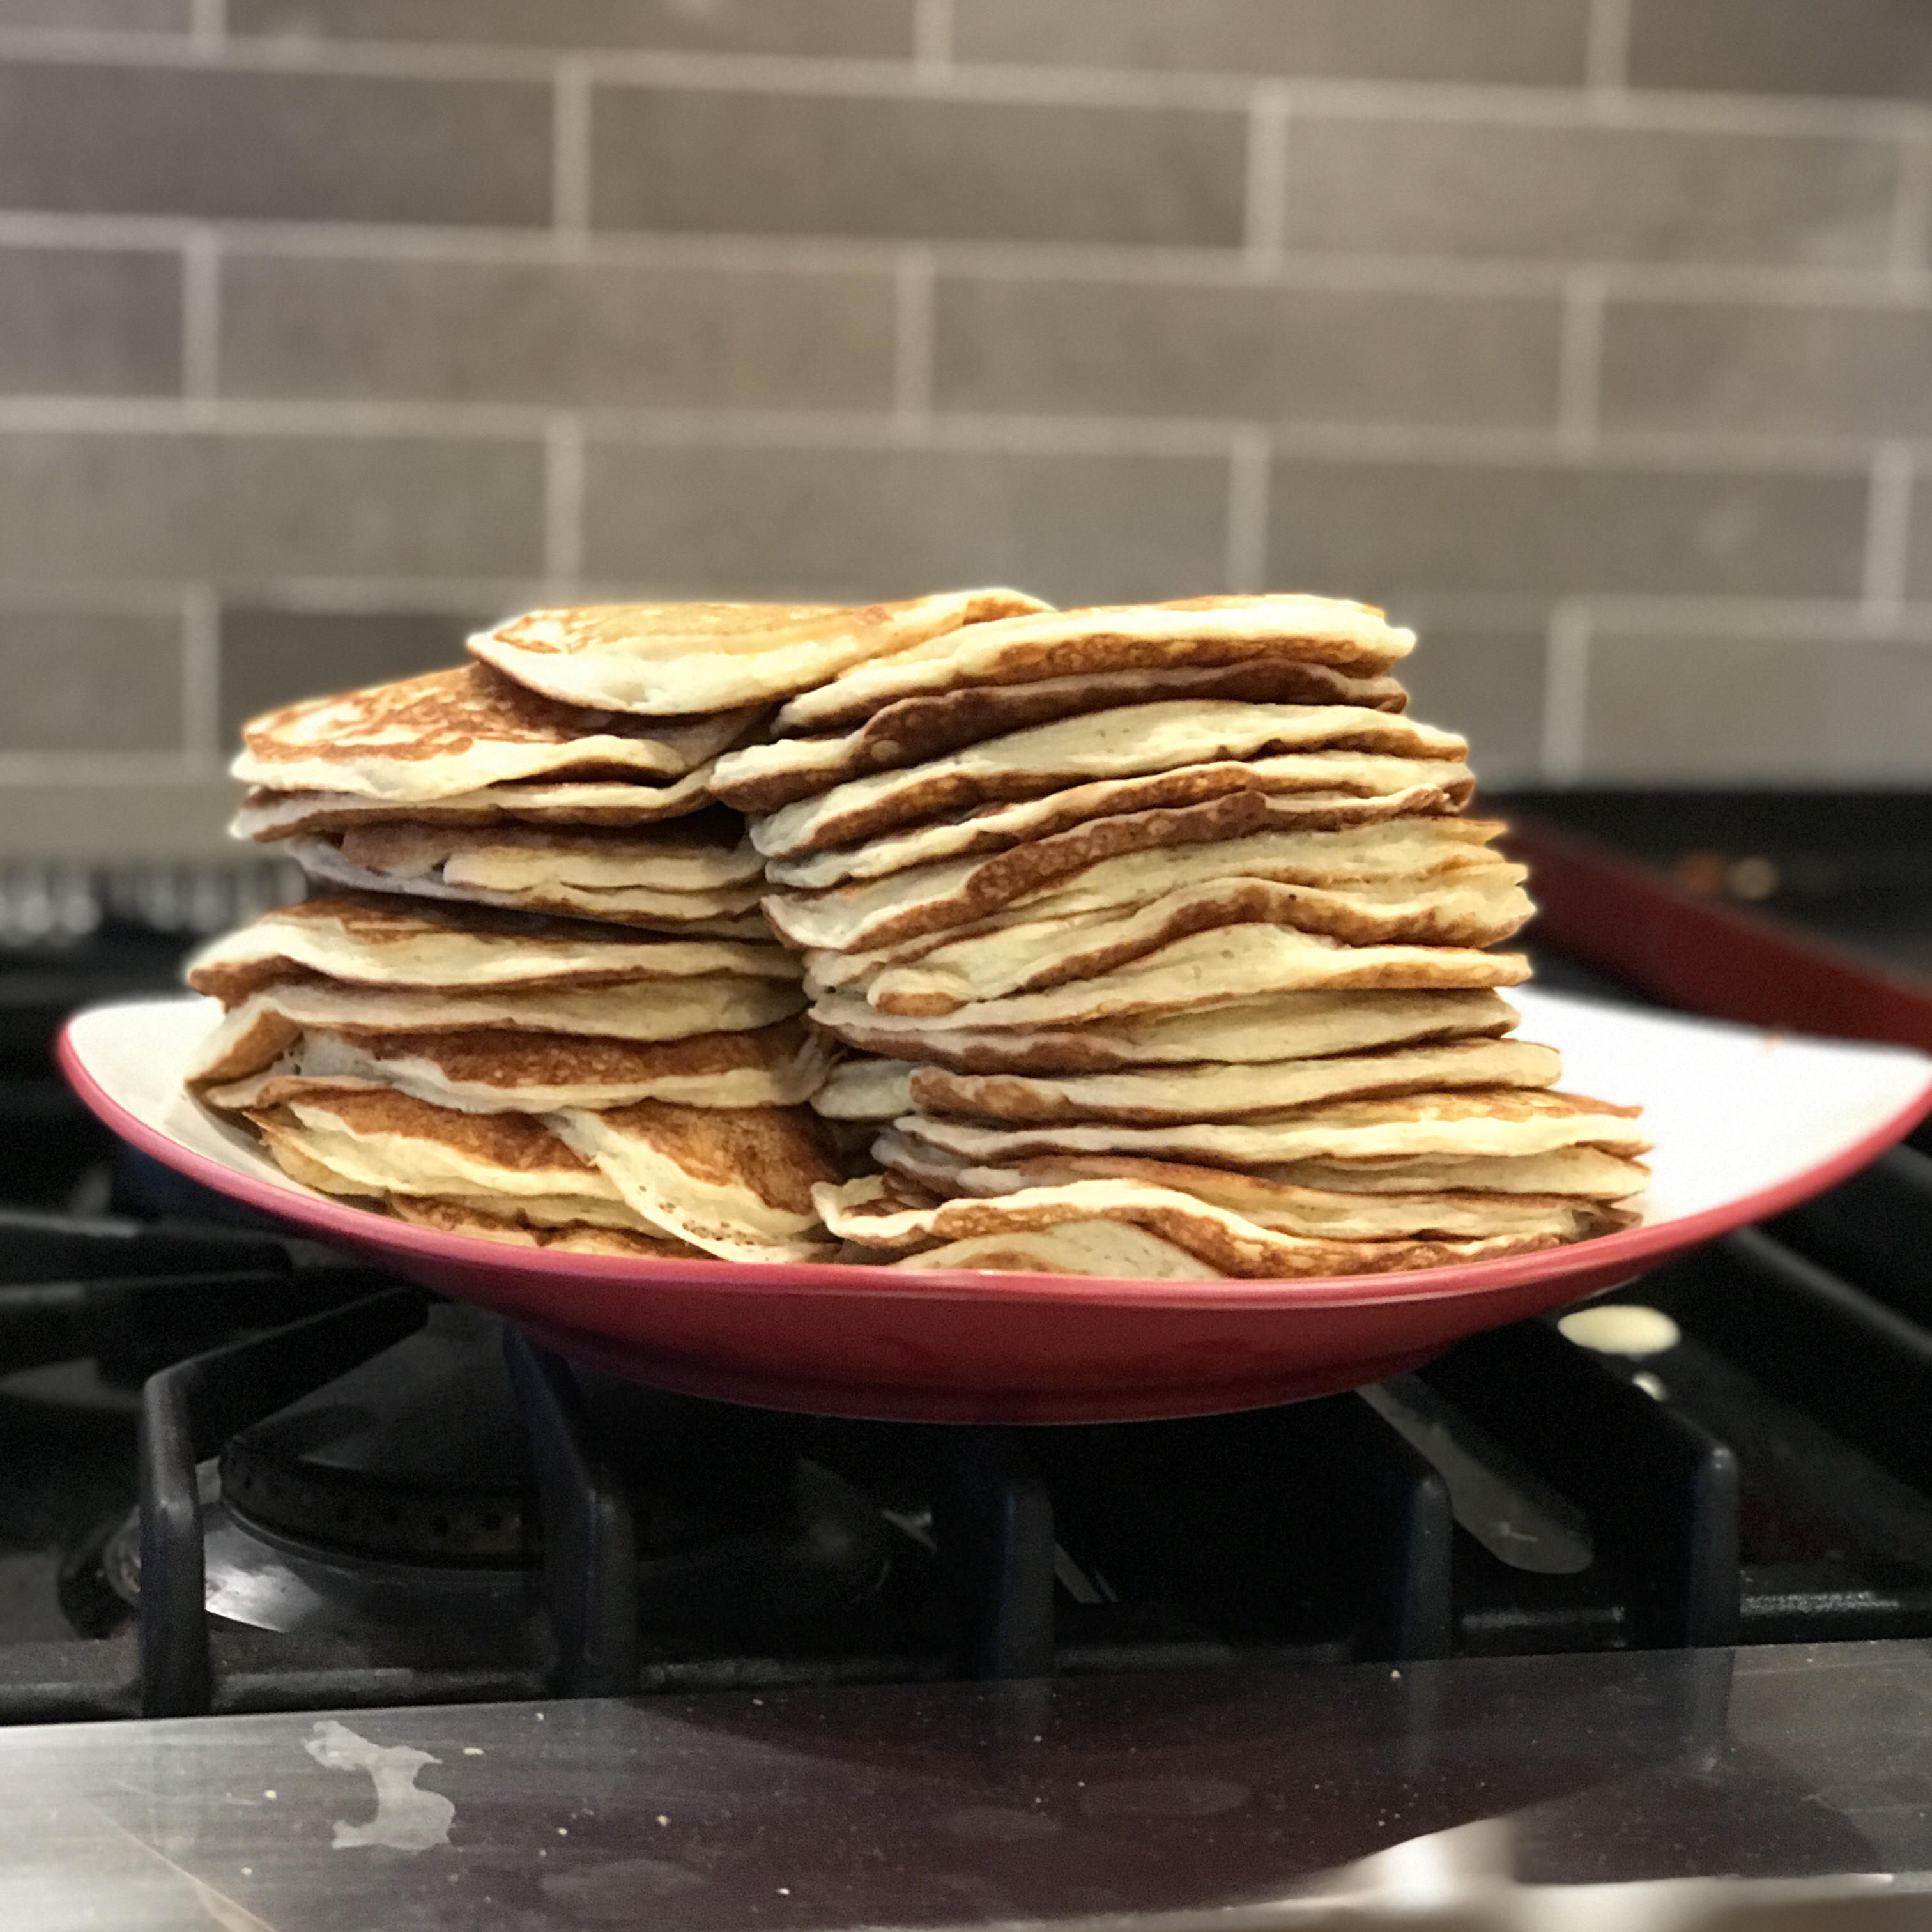 Lemon-Ricotta Pancakes antnyc